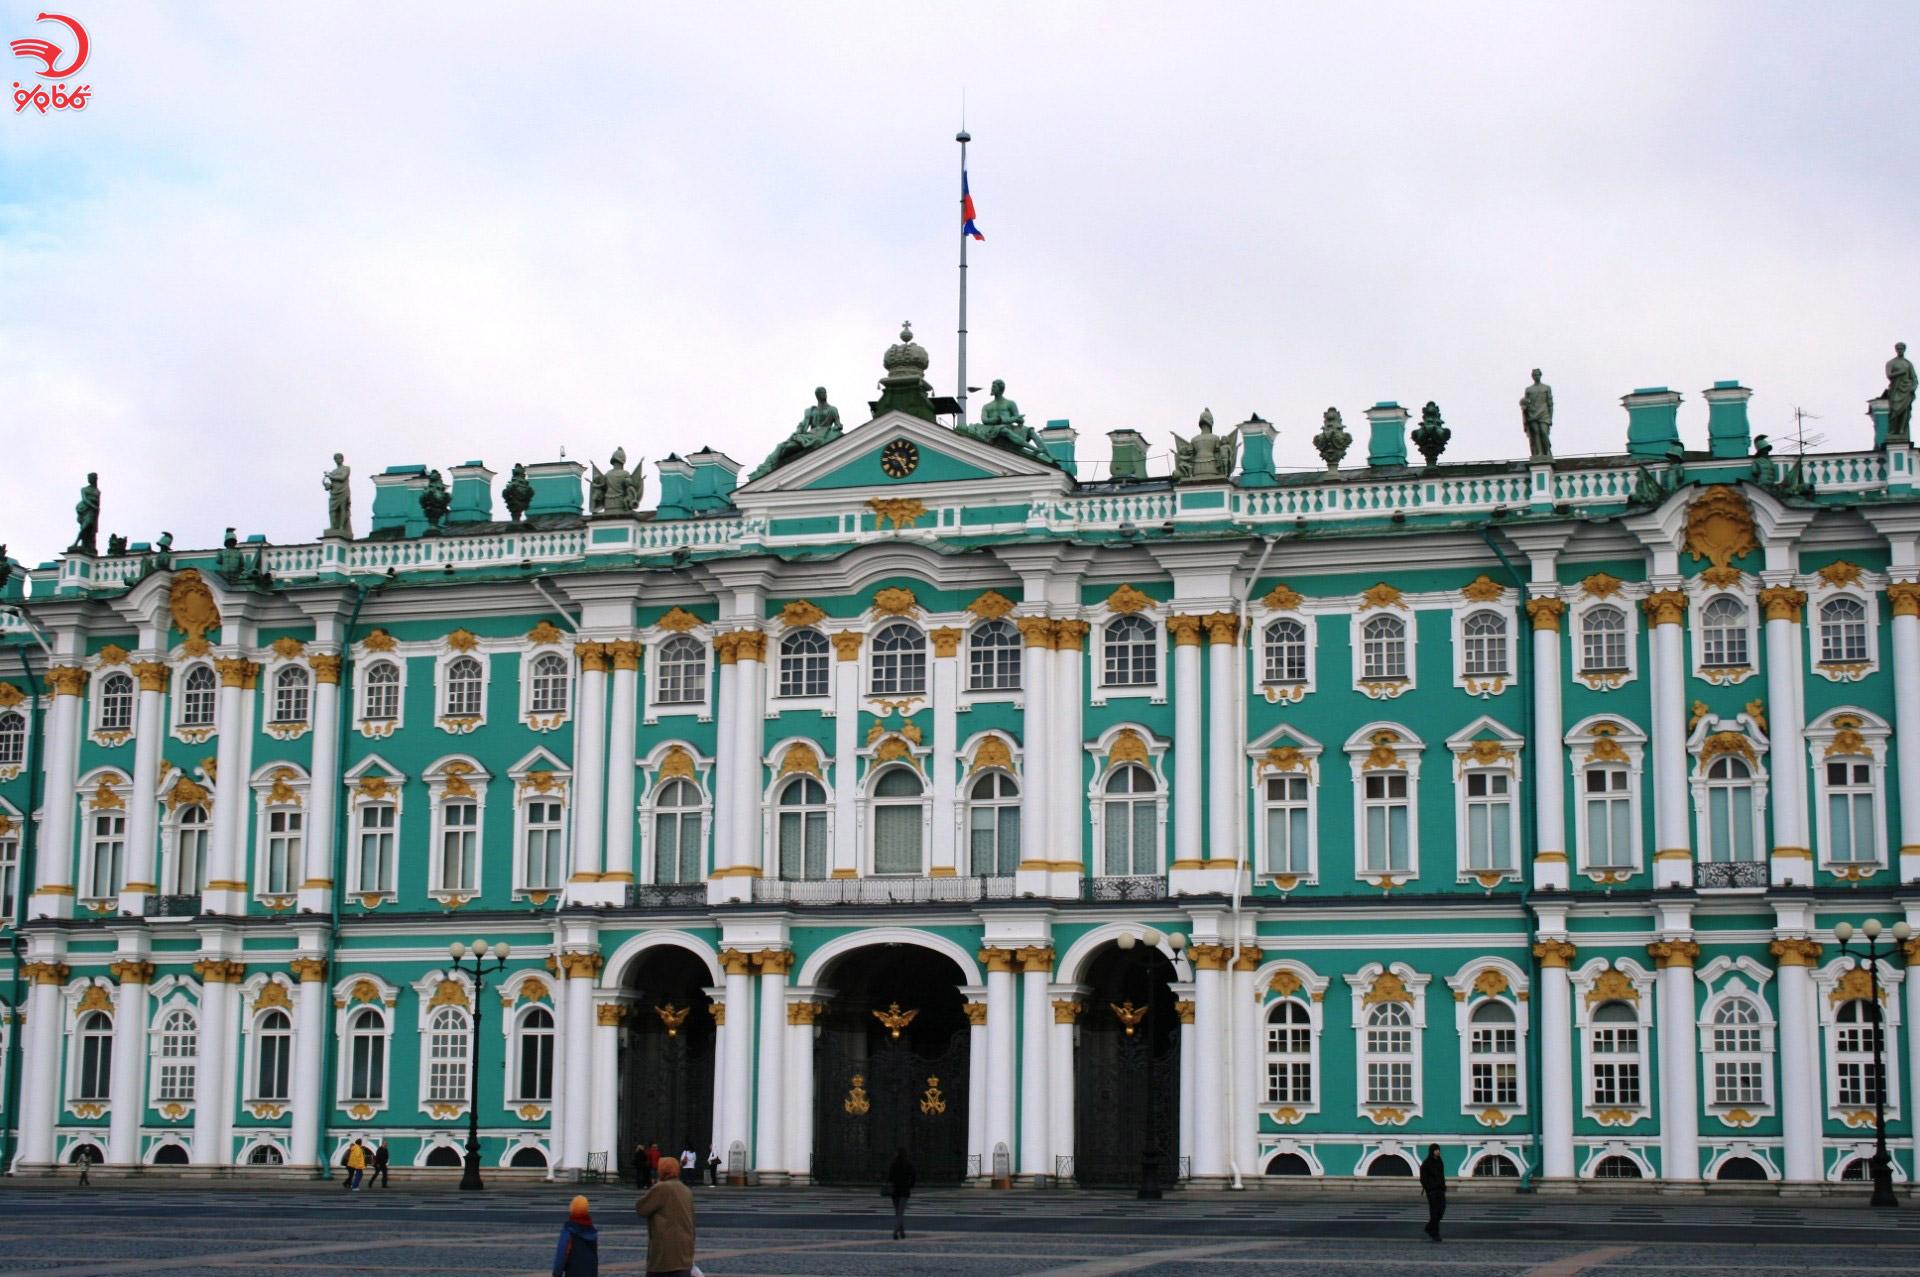 کاخ زمستانی، سنت پترزبورگ، روسیه